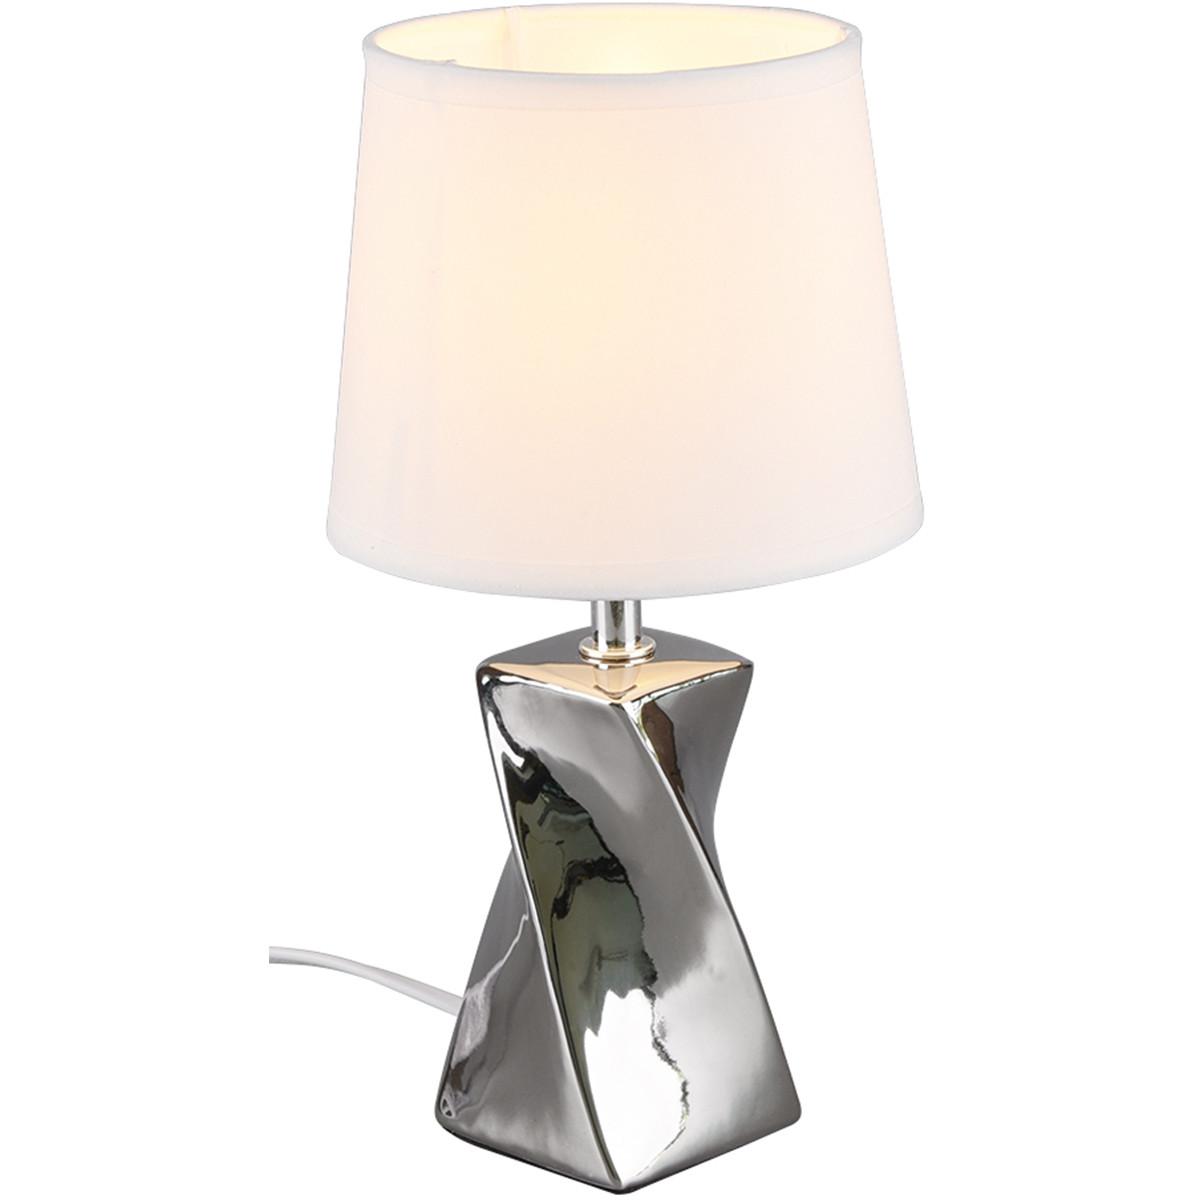 LED Tafellamp - Trion Aneby - E14 Fitting - Rond - Glans Chroom - Keramiek/Textiel